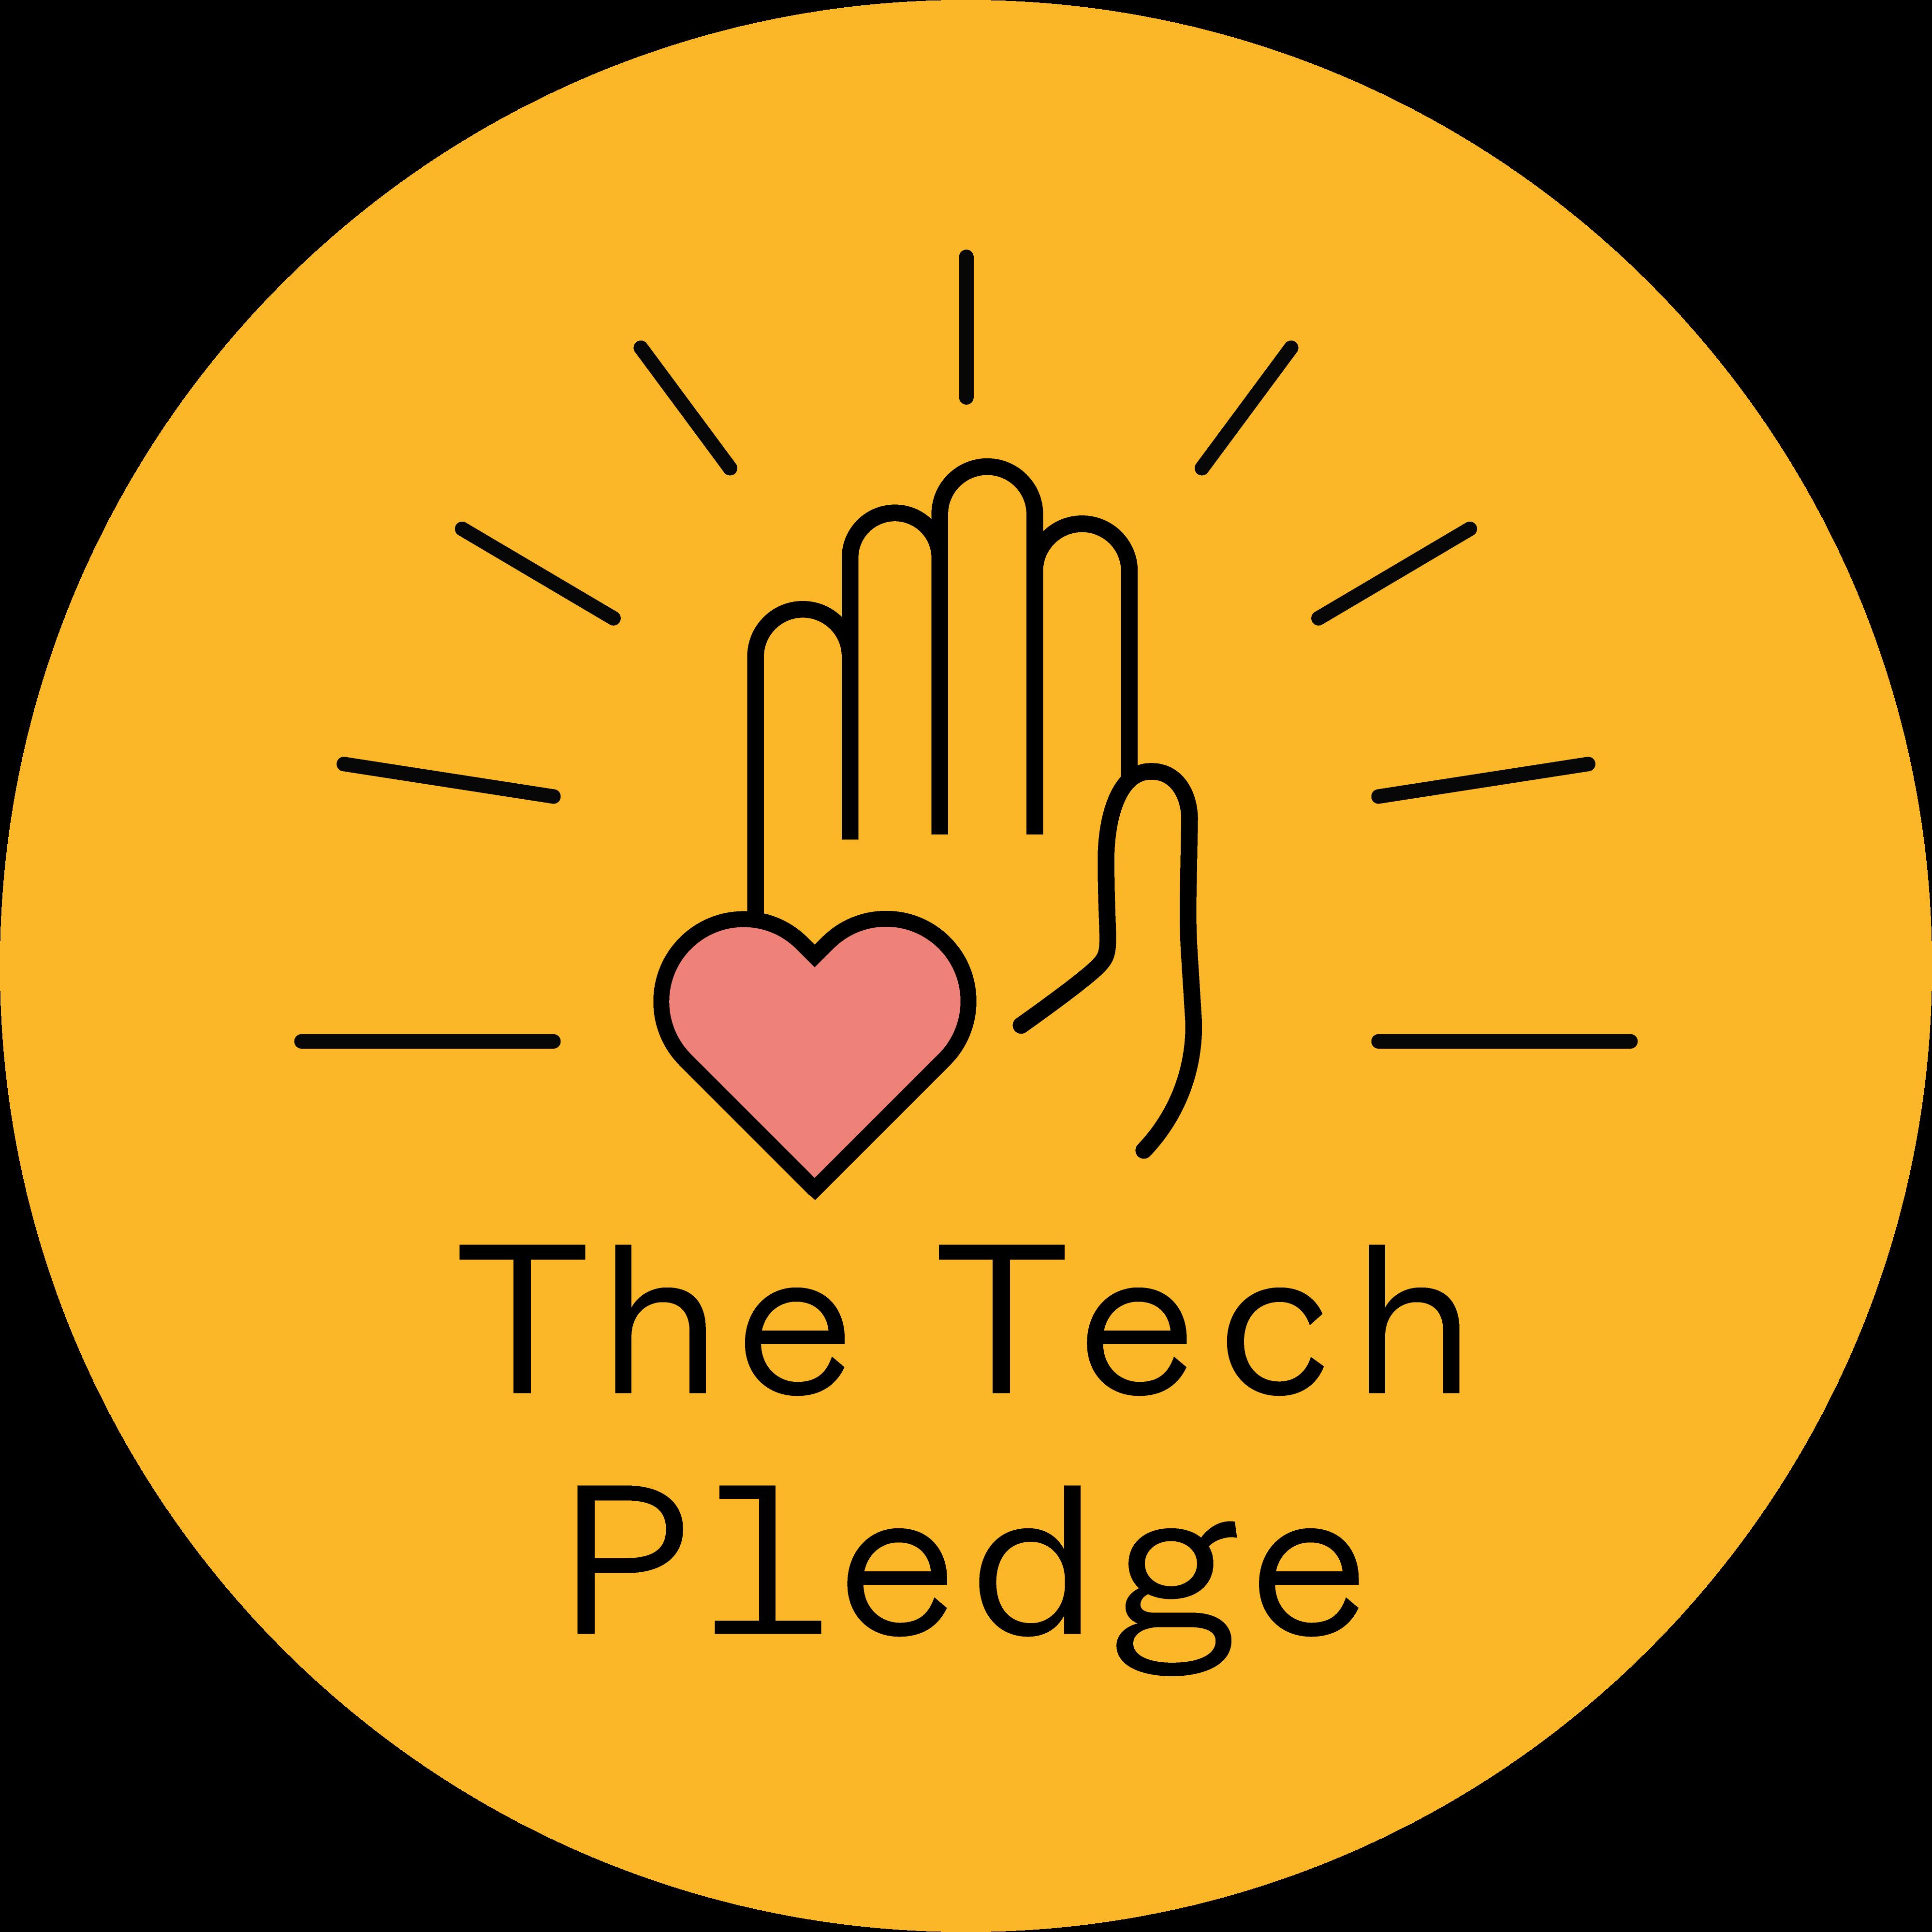 Pledge-Hand